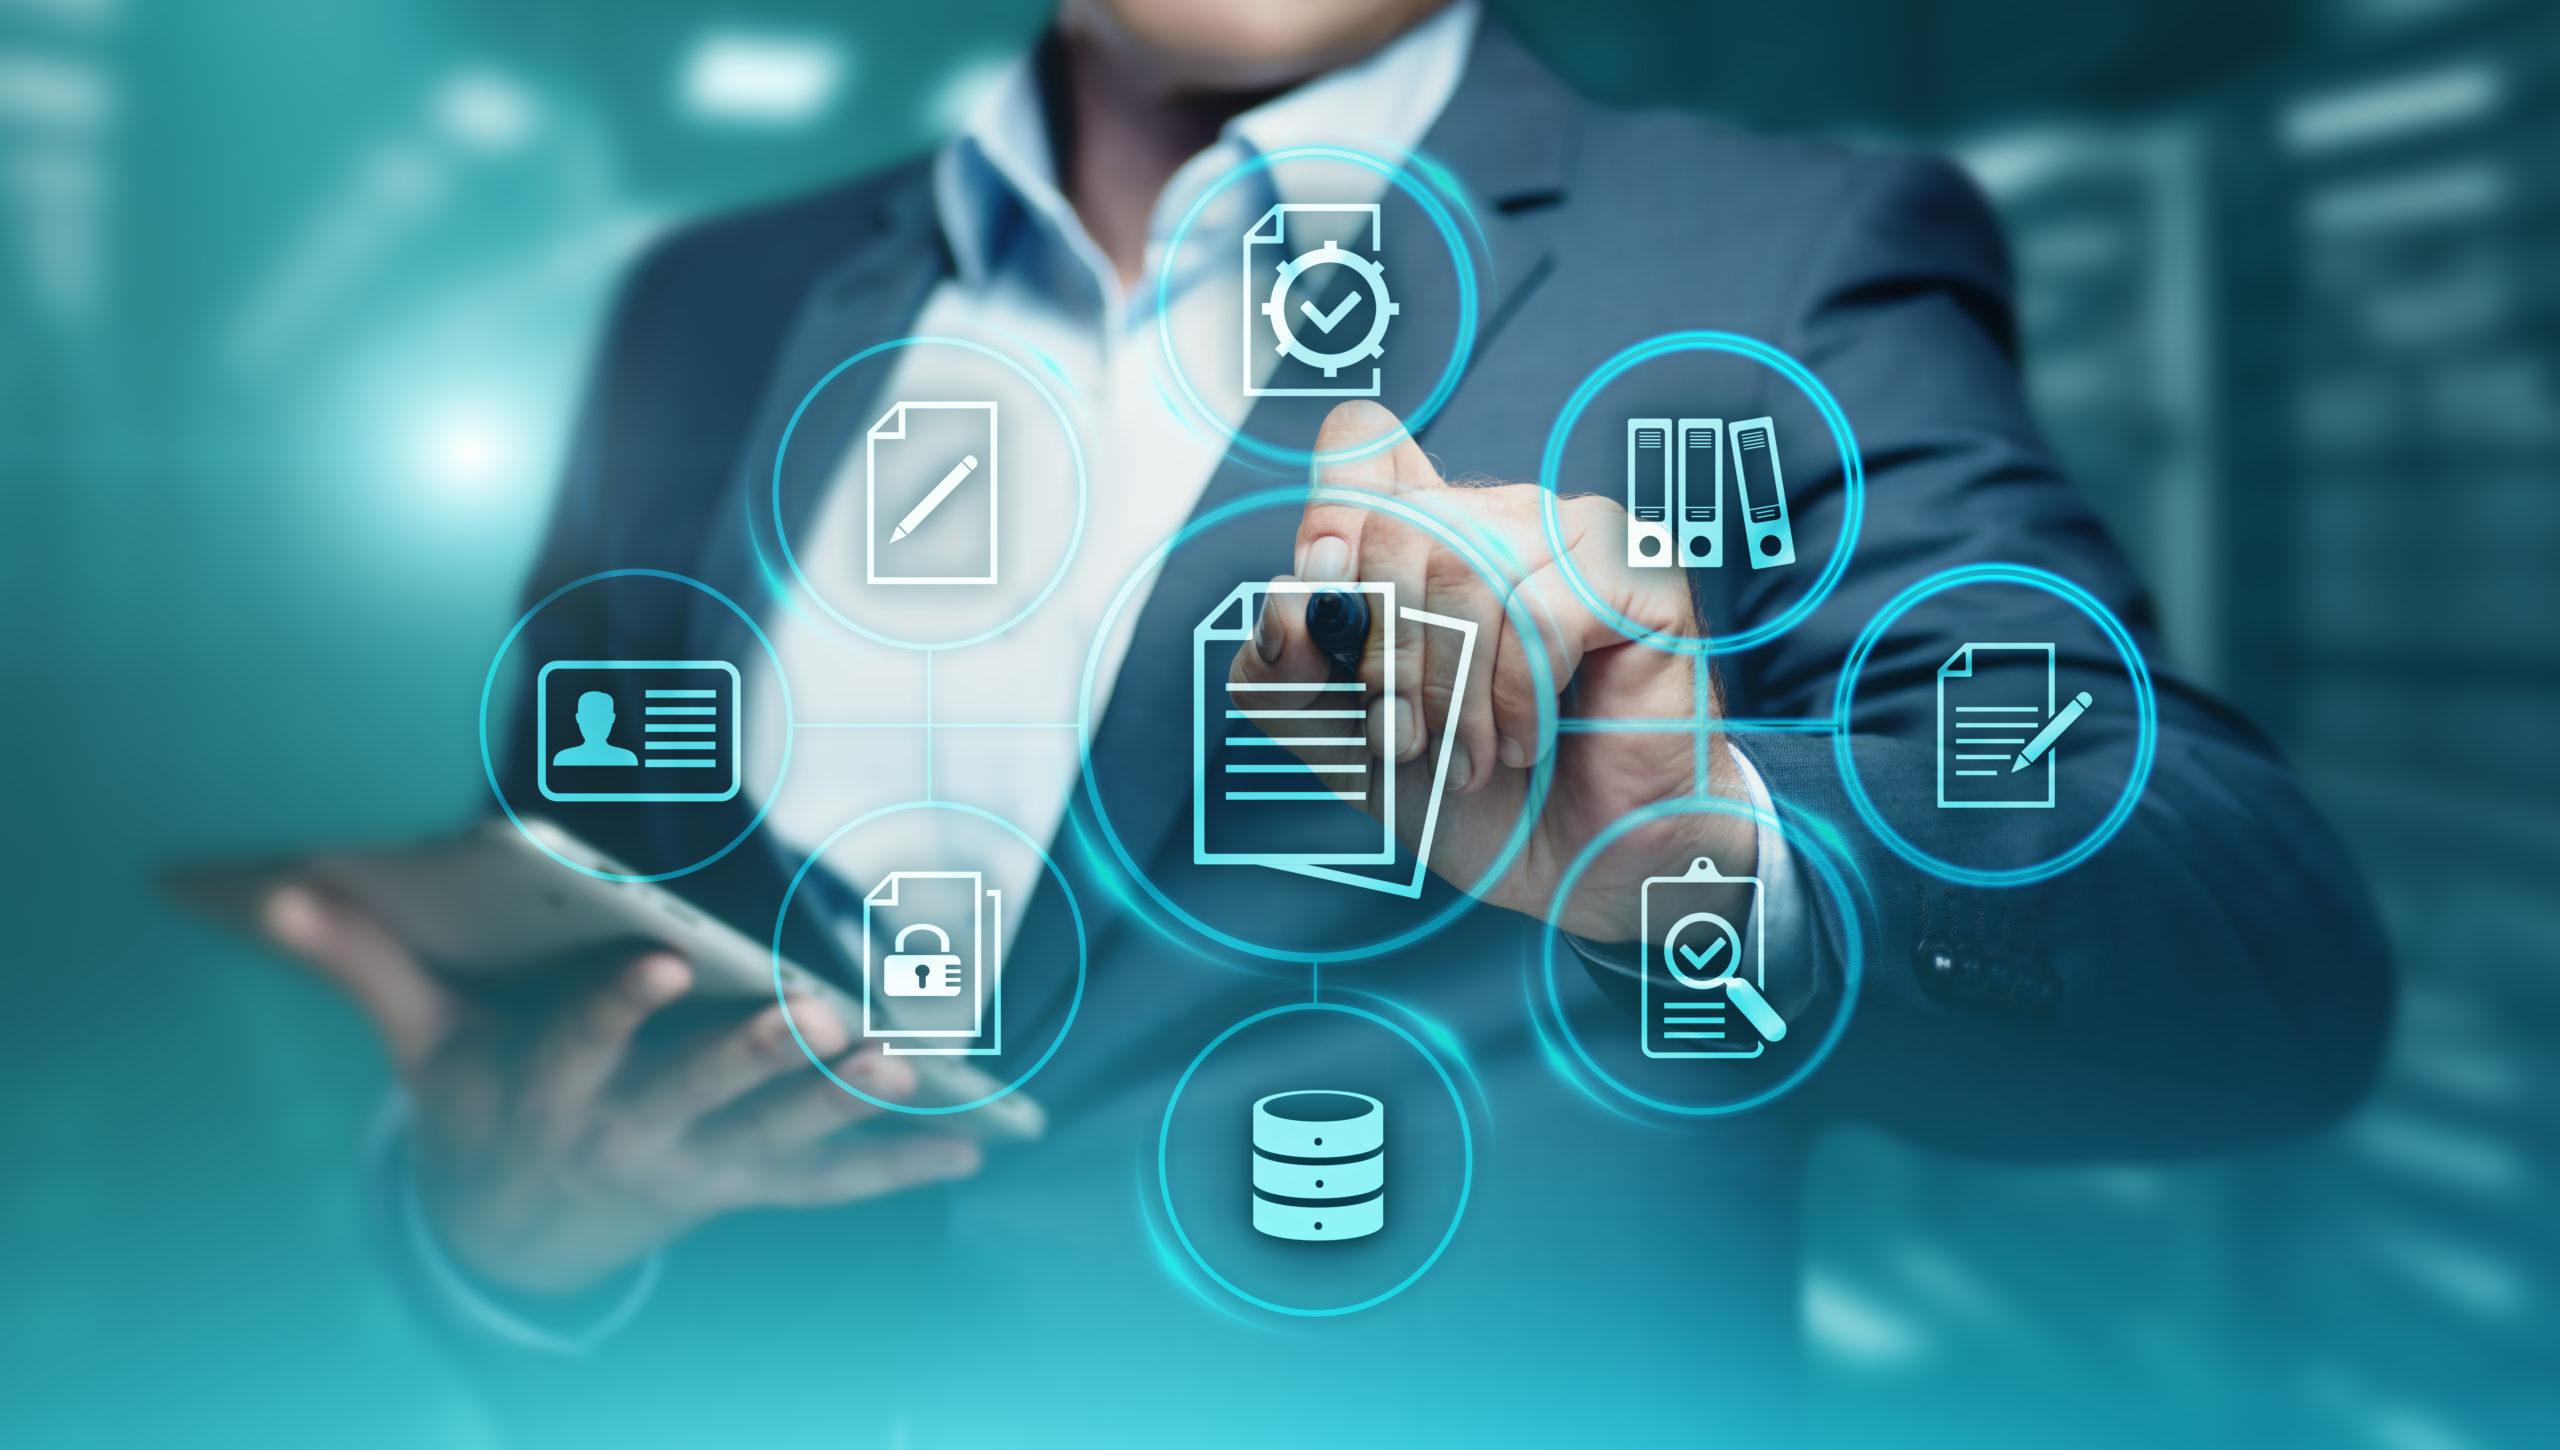 Document,Management,Data,System,Business,Internet,Technology,Concept.